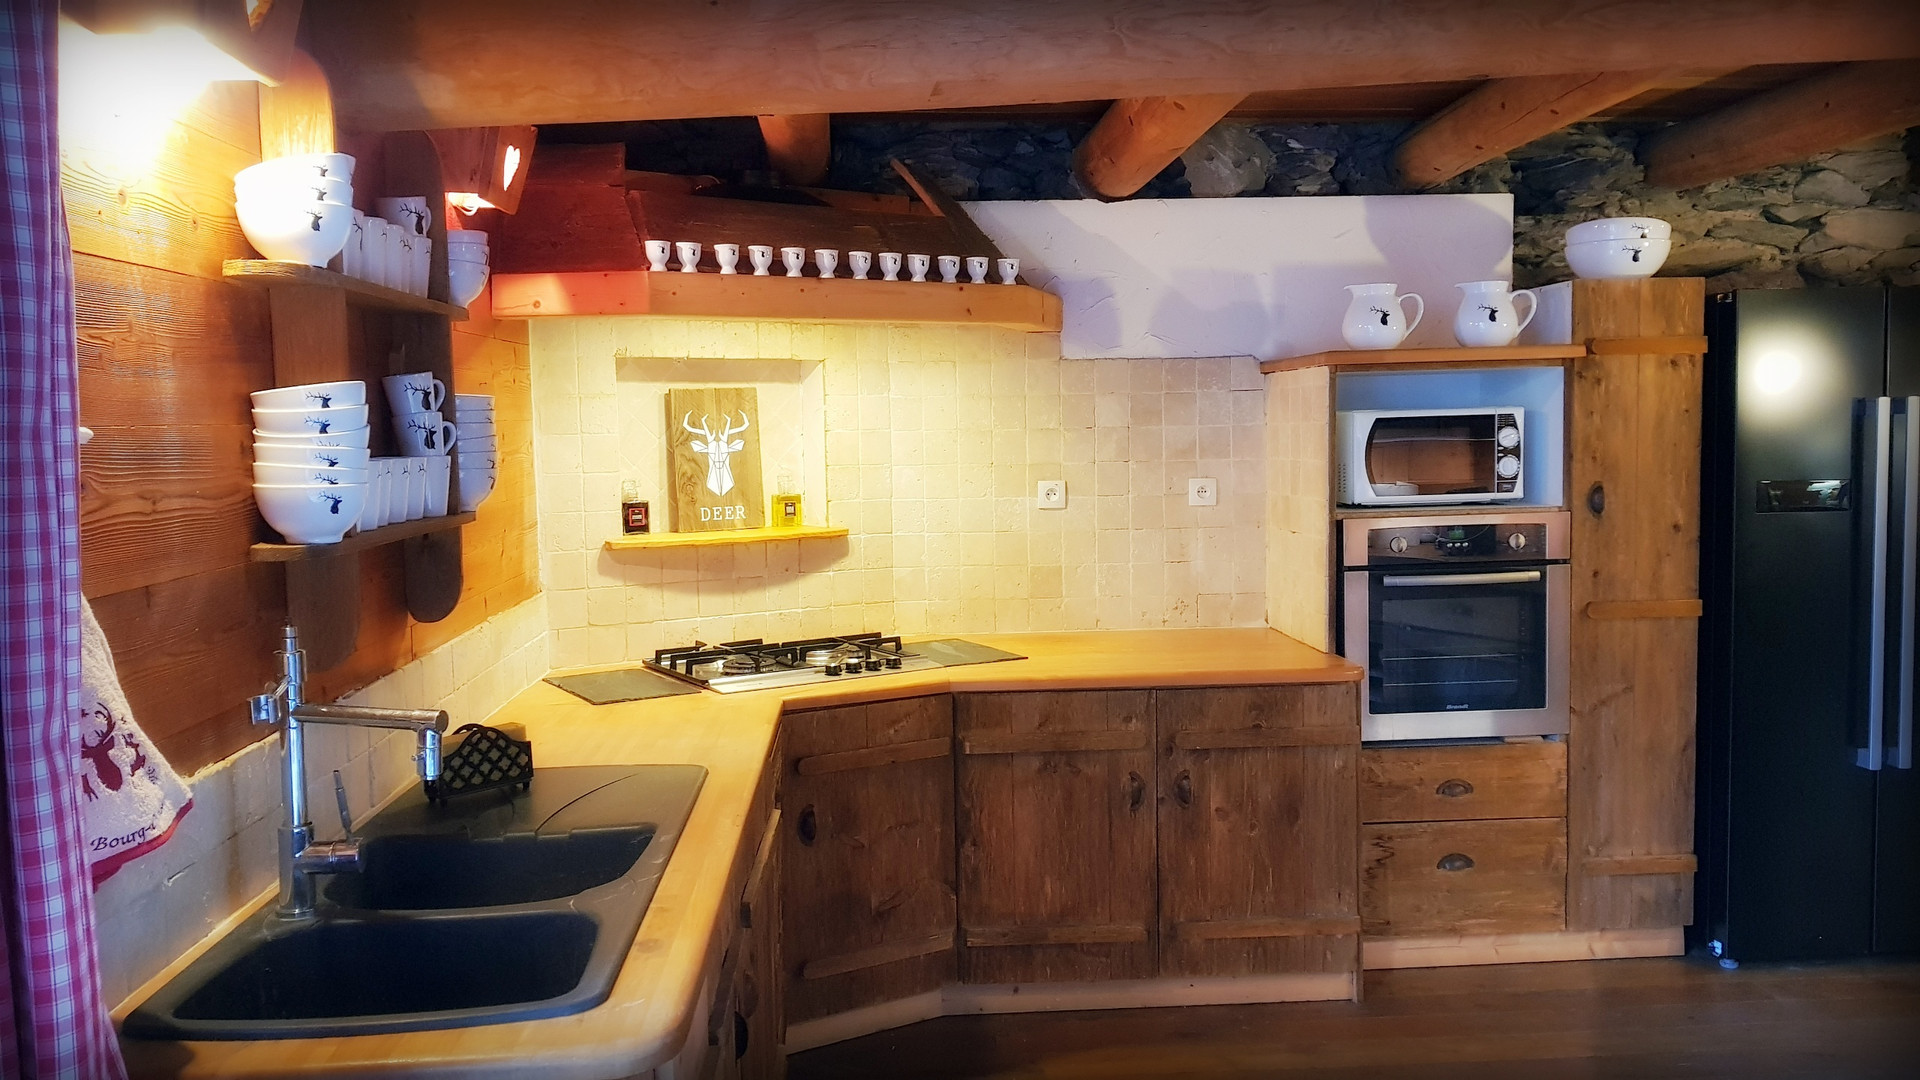 Cuisine Cosy Lodge Bourg D'Oisans.jpg